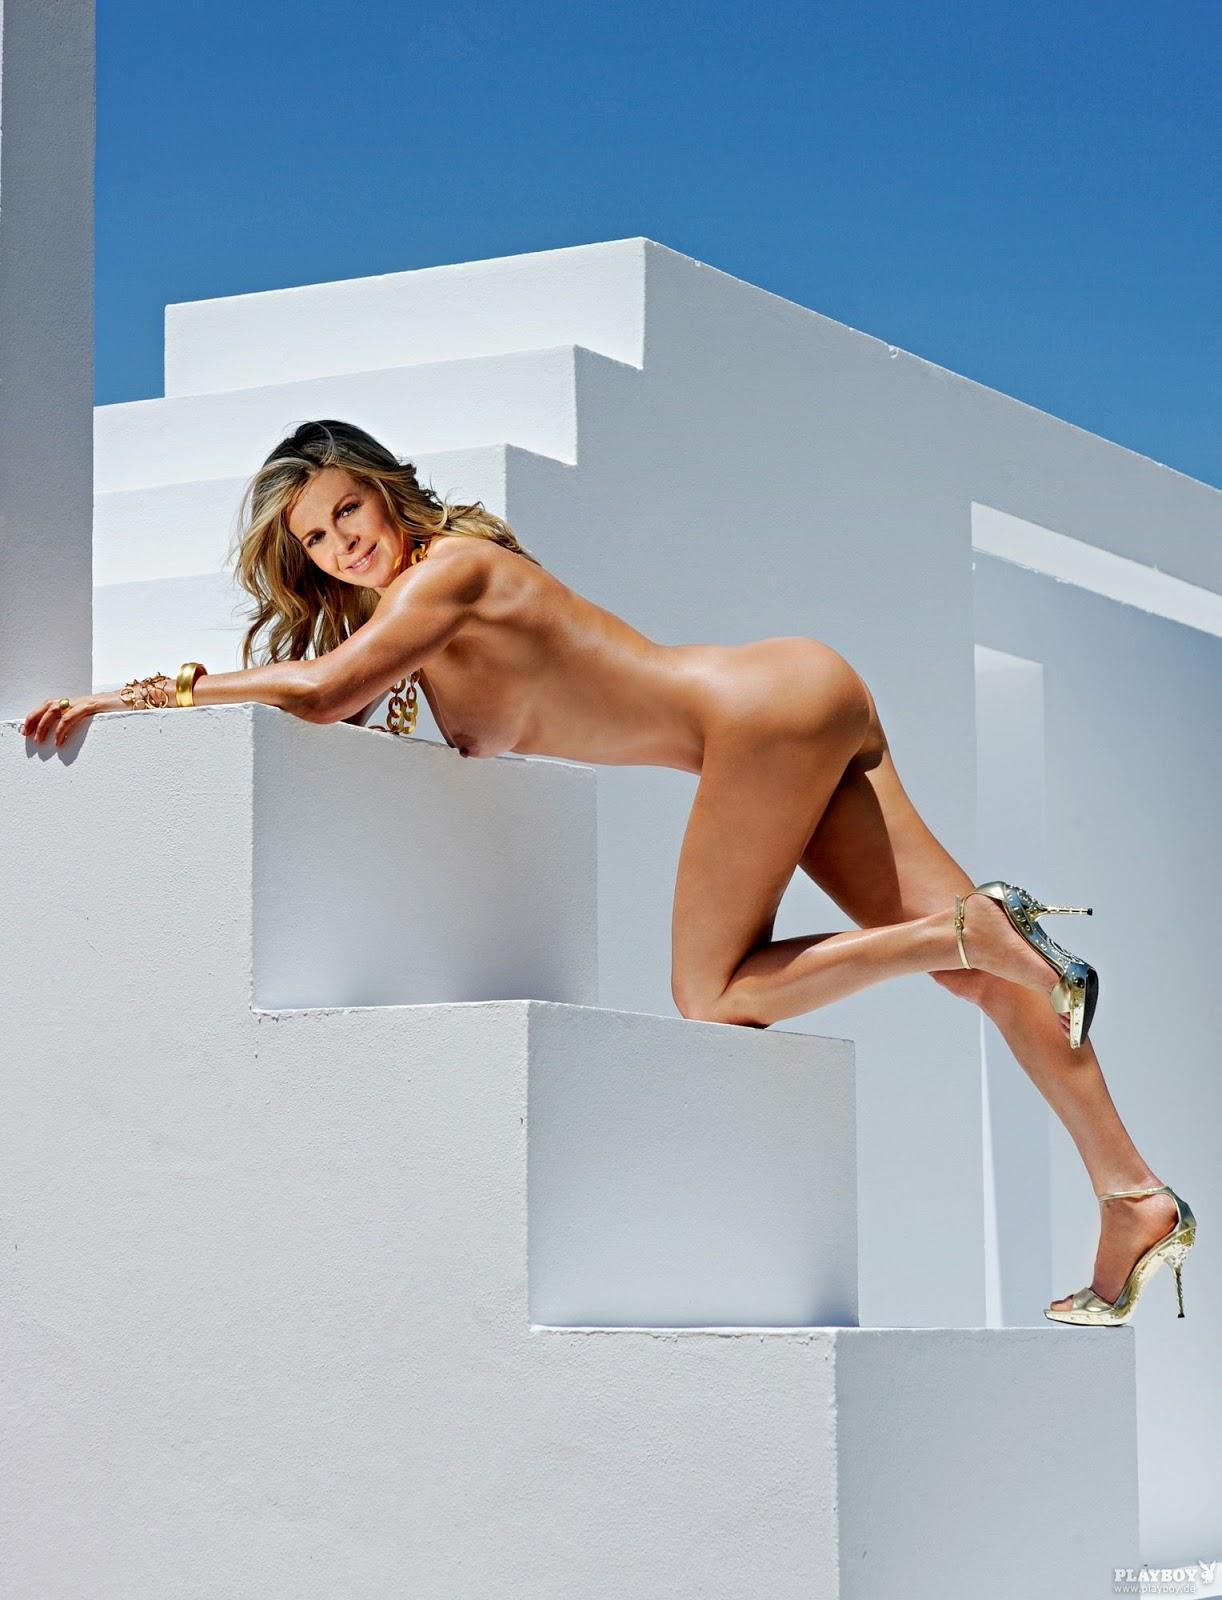 100 Pictures of Angela Maurer Nude